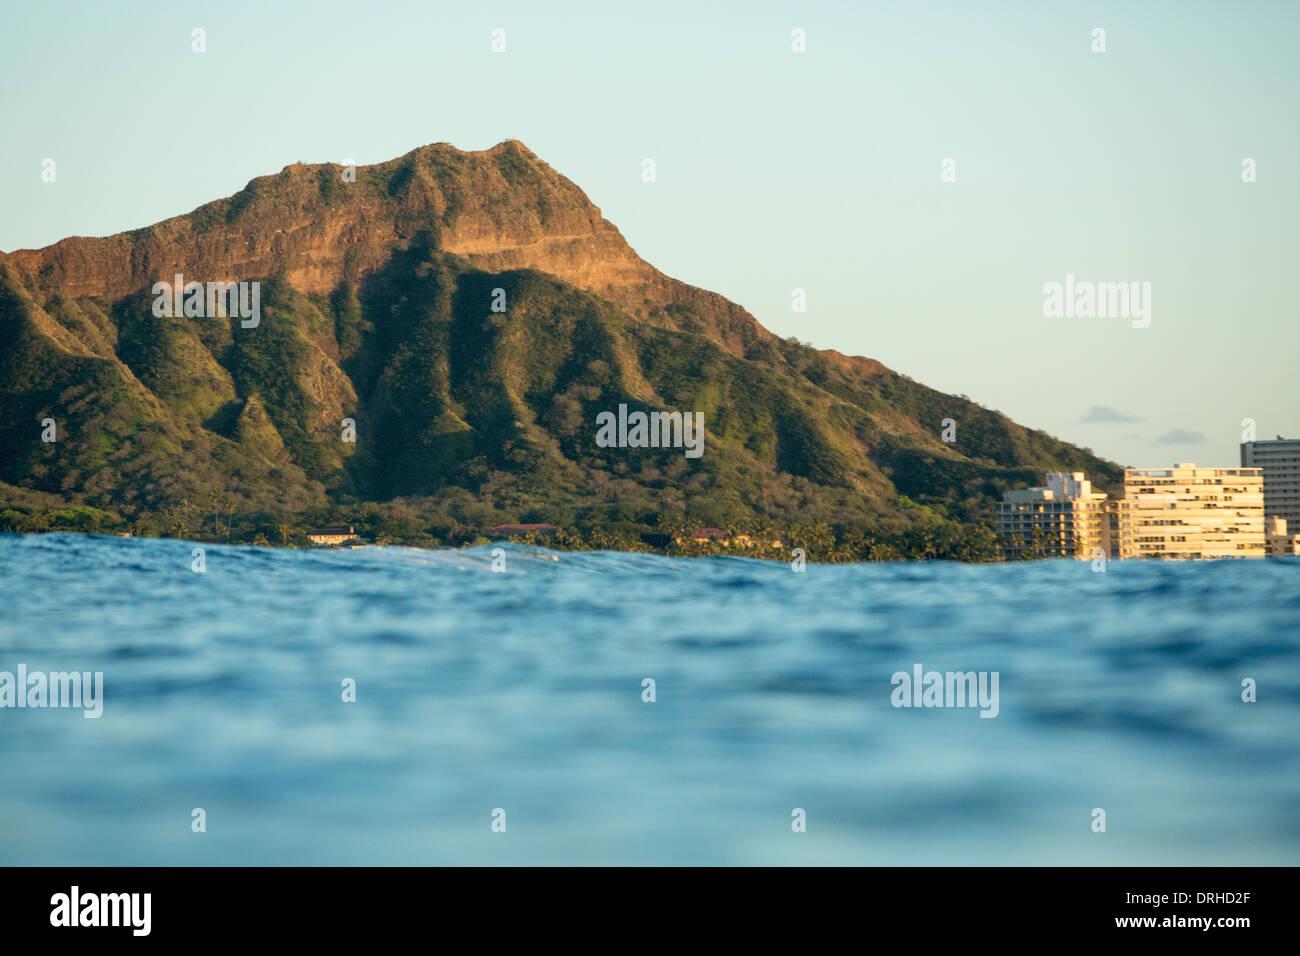 Hawaii [Diamond Head] Waikiki Beach green foliage ocean winter Honolulu Oahu [Kapiolani Park] Natatorium - Stock Image